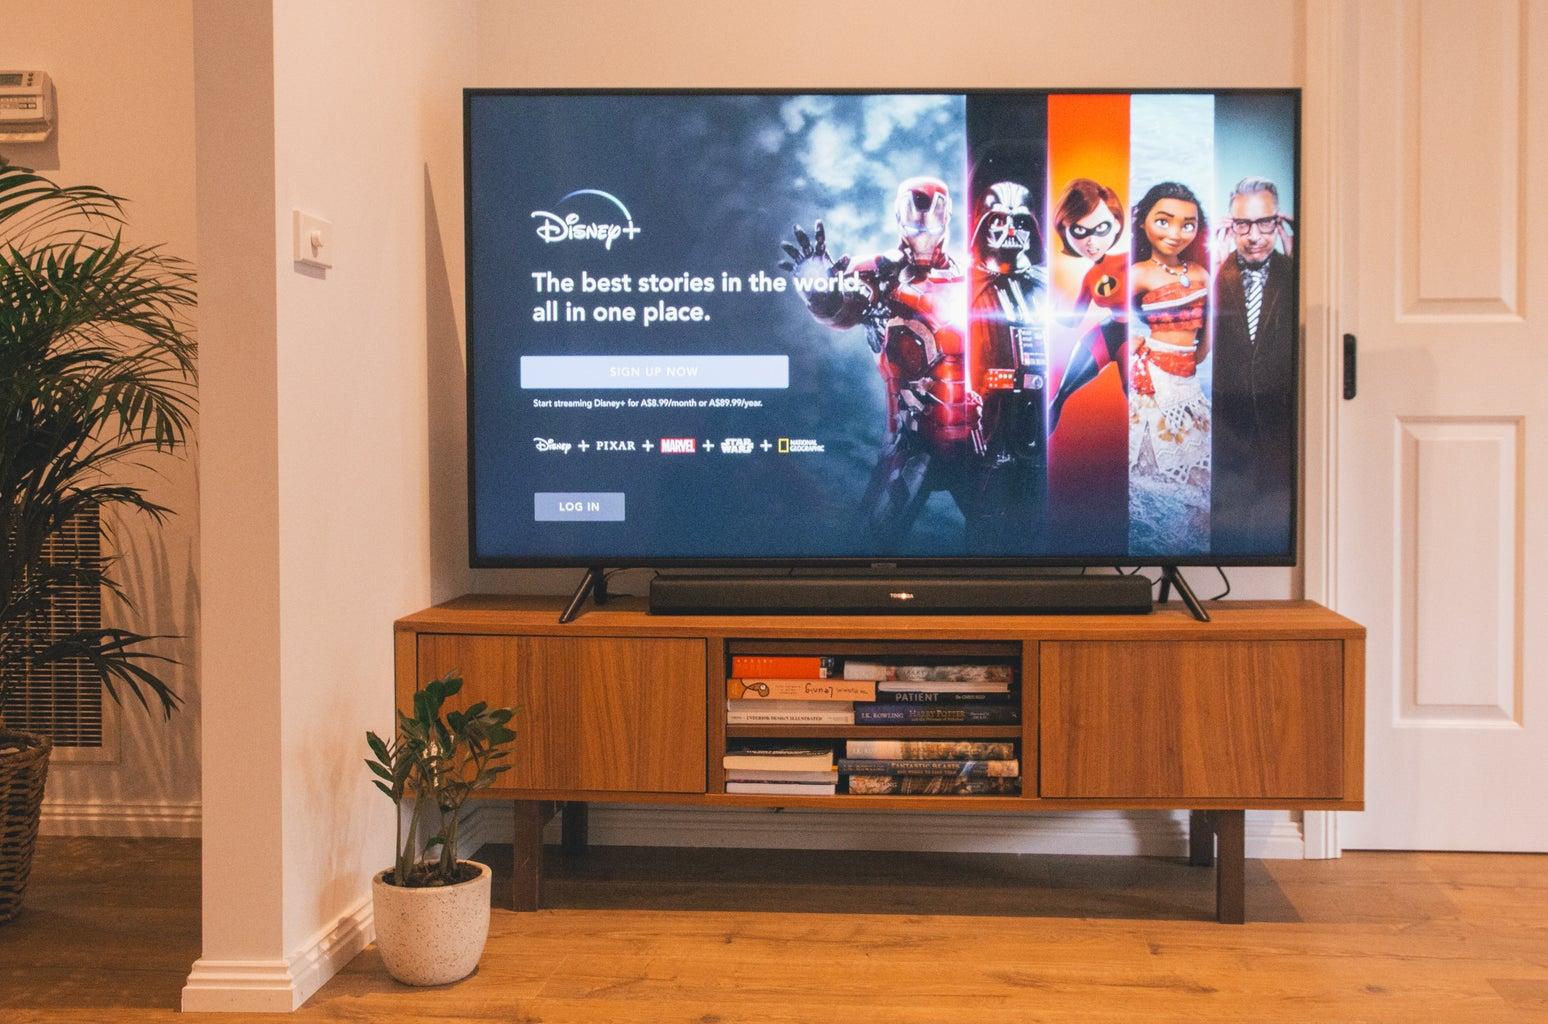 Disney plus on tv on stand showing disney plus